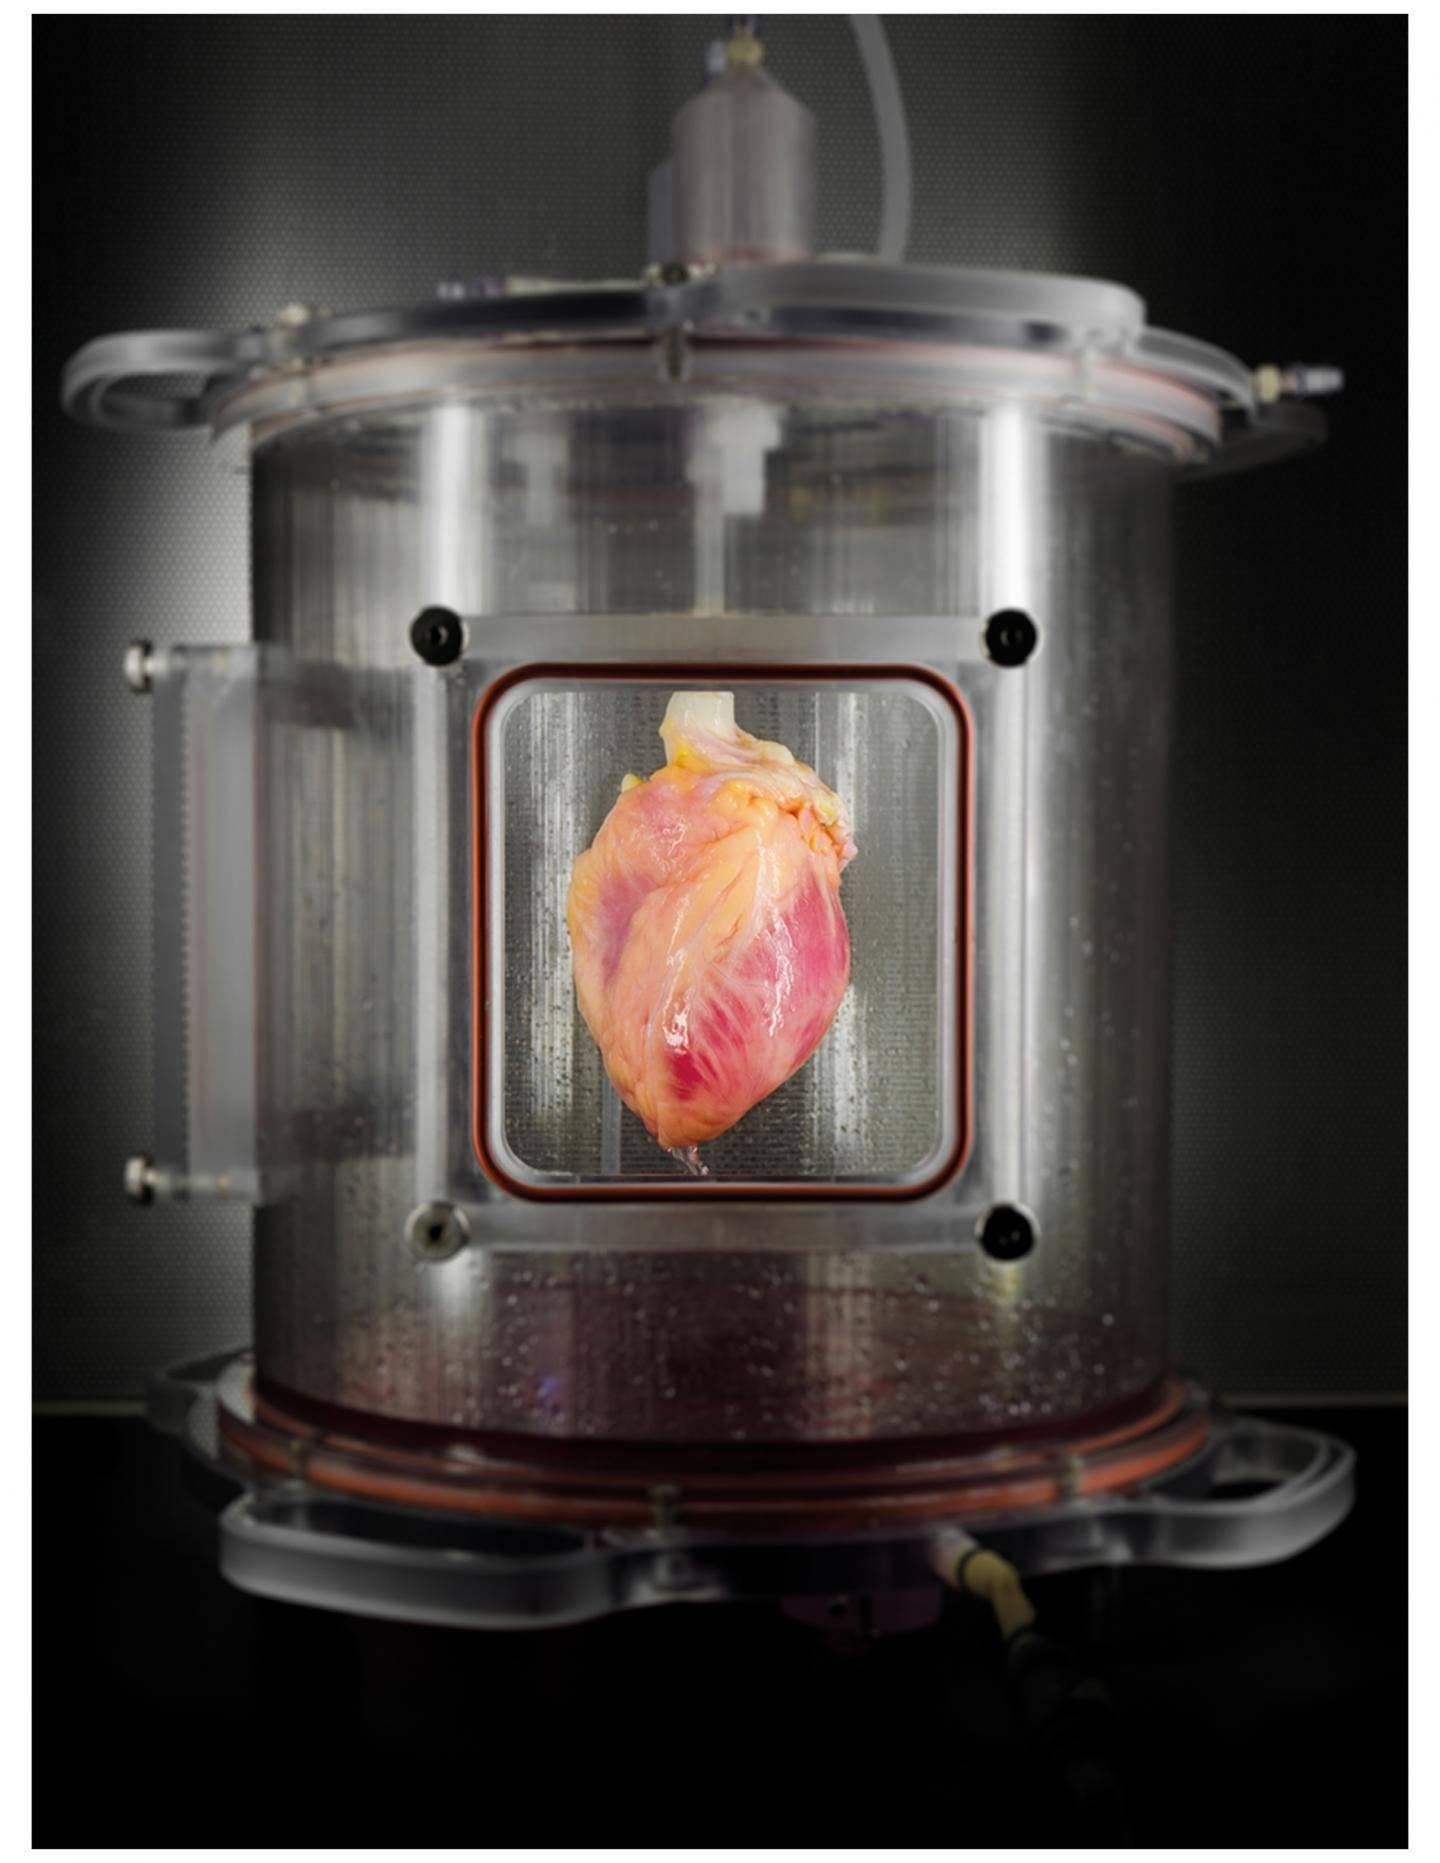 Reproducing human organs